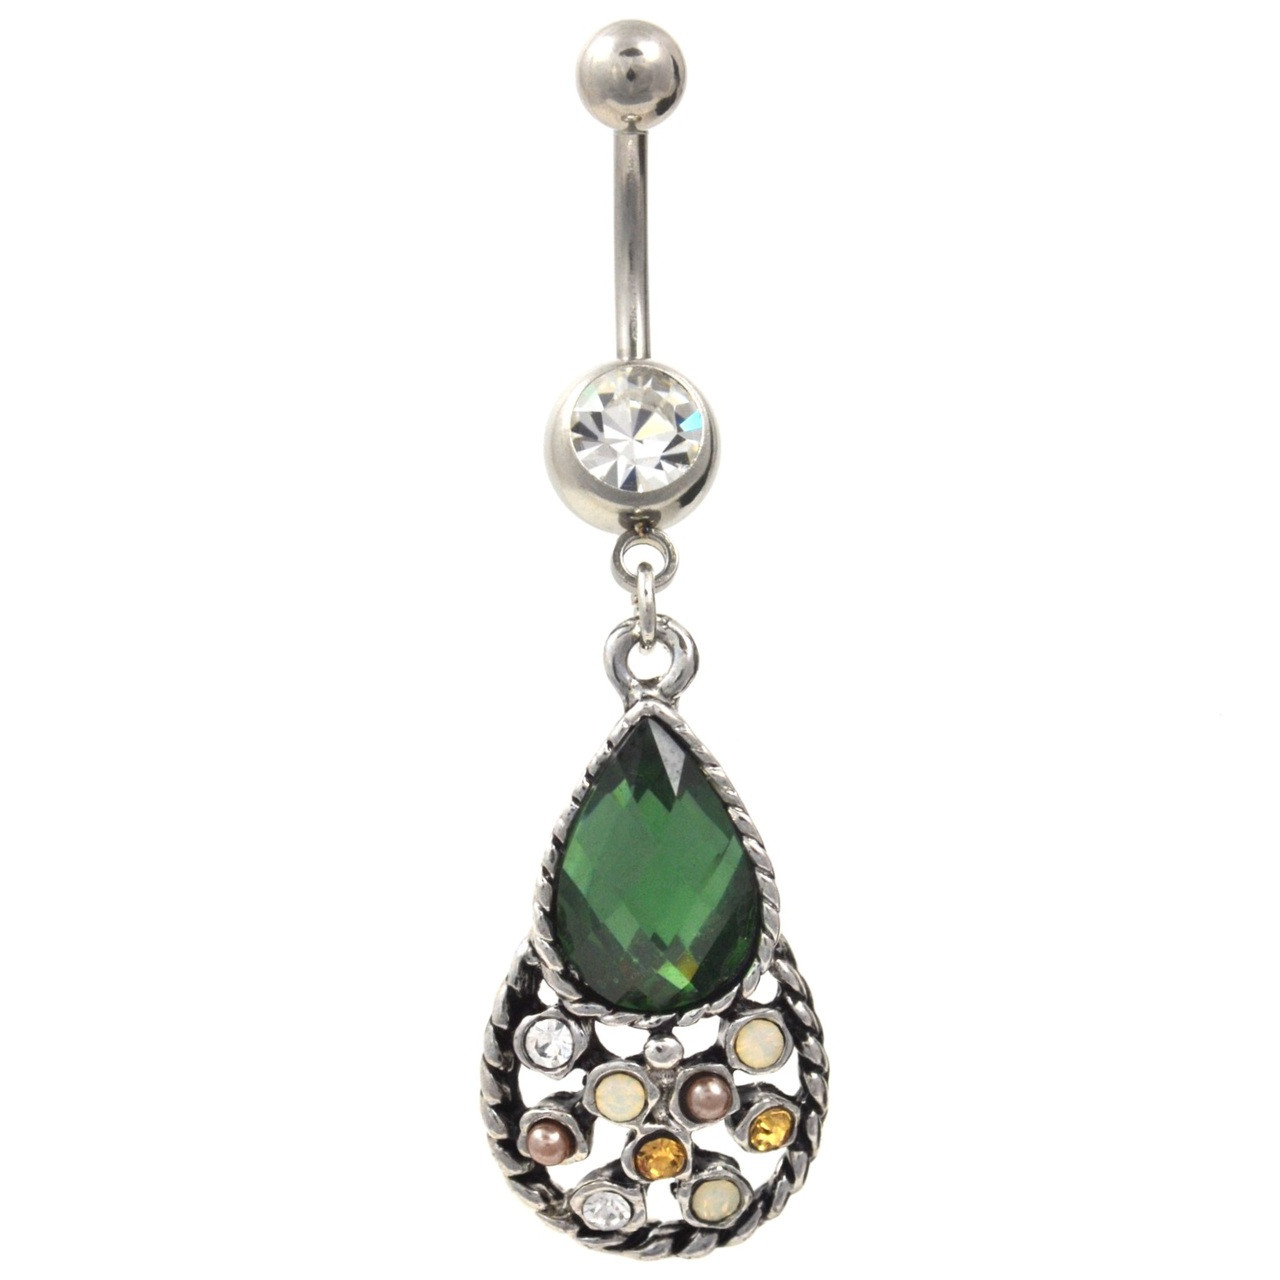 emerald green tear drop pendant belly ring bodydazz